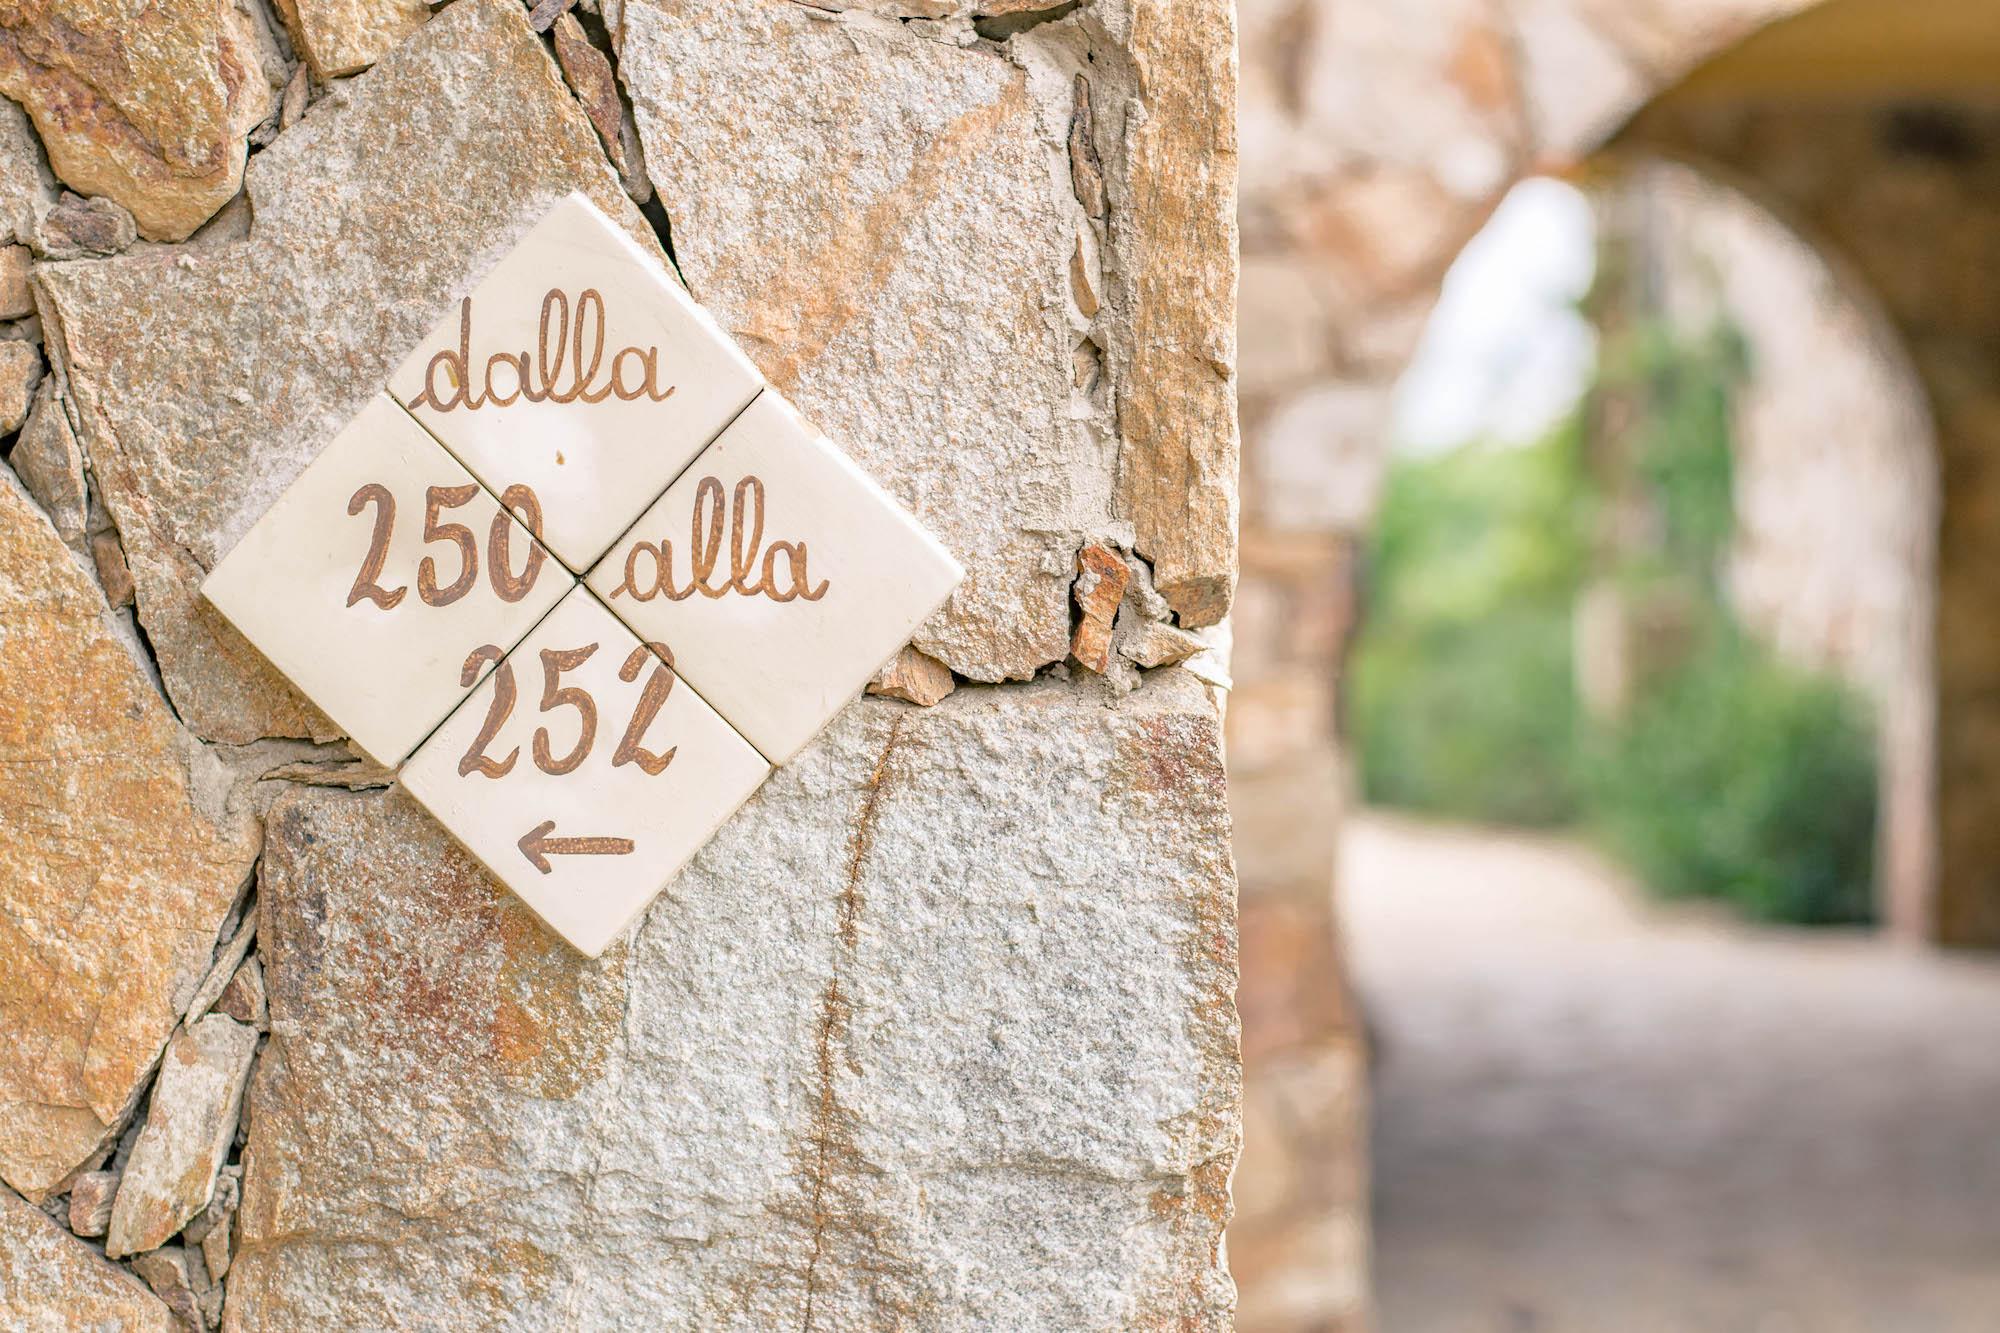 valle-dell-erica-10